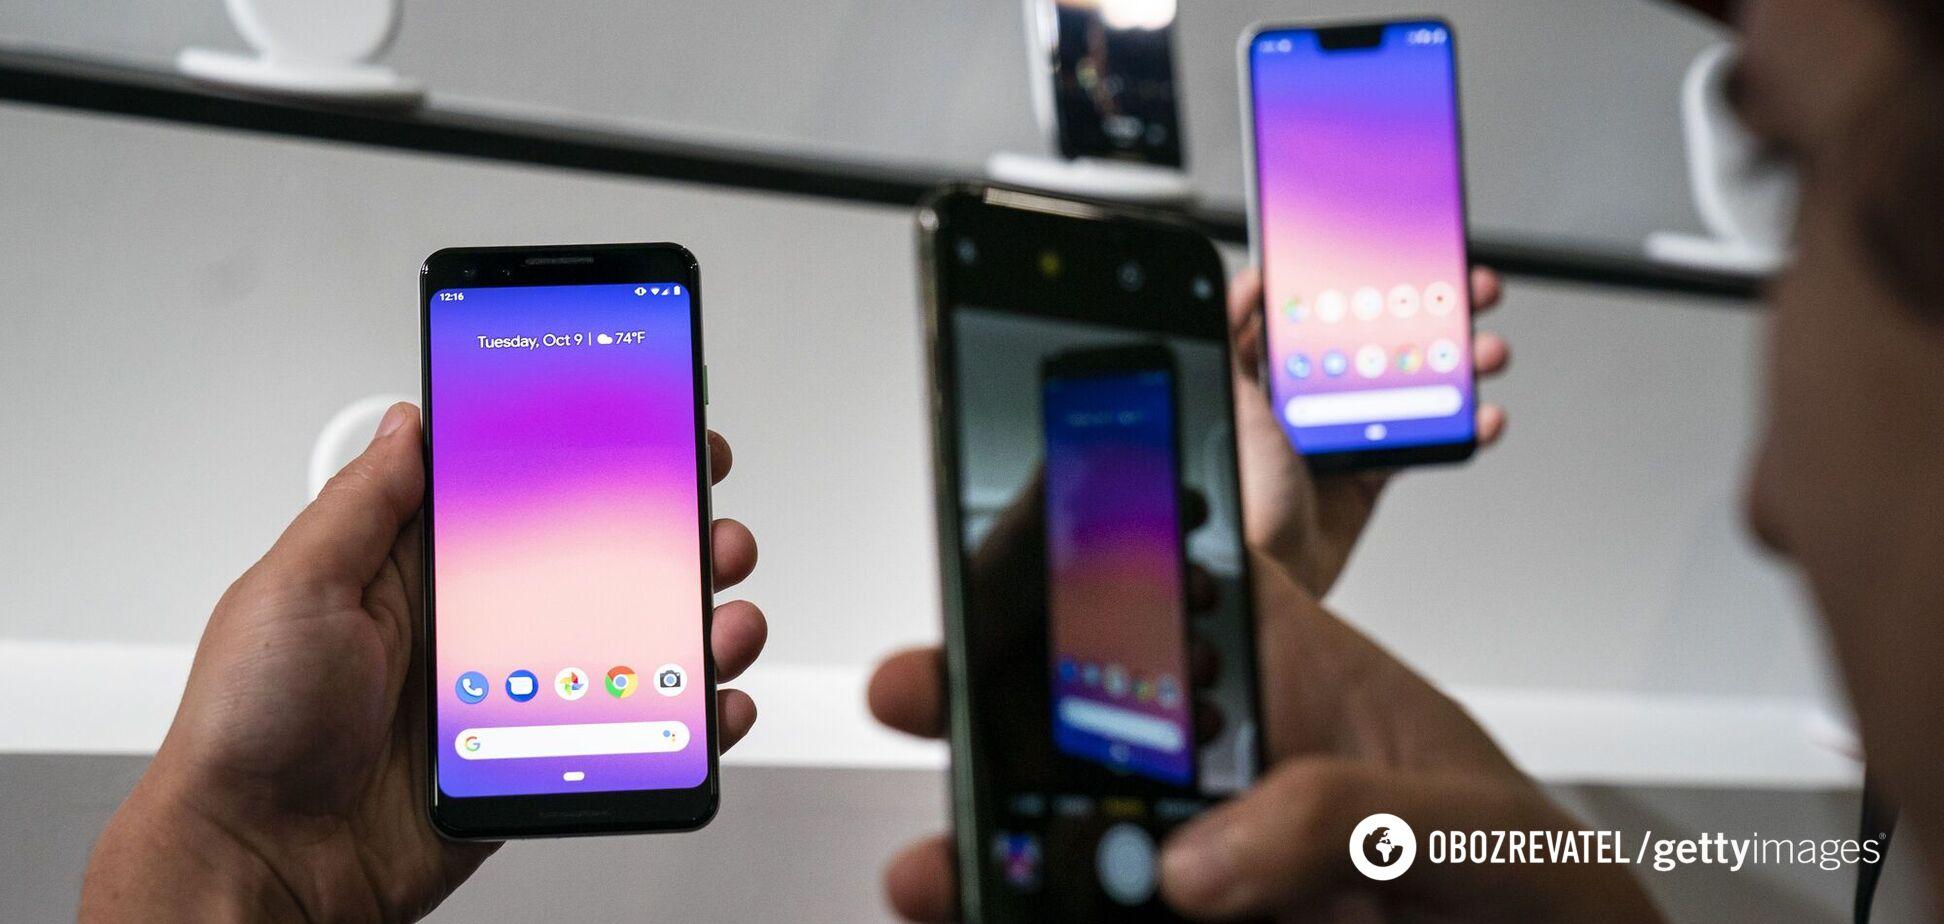 Названо ознаки швидкої 'смерті' смартфона